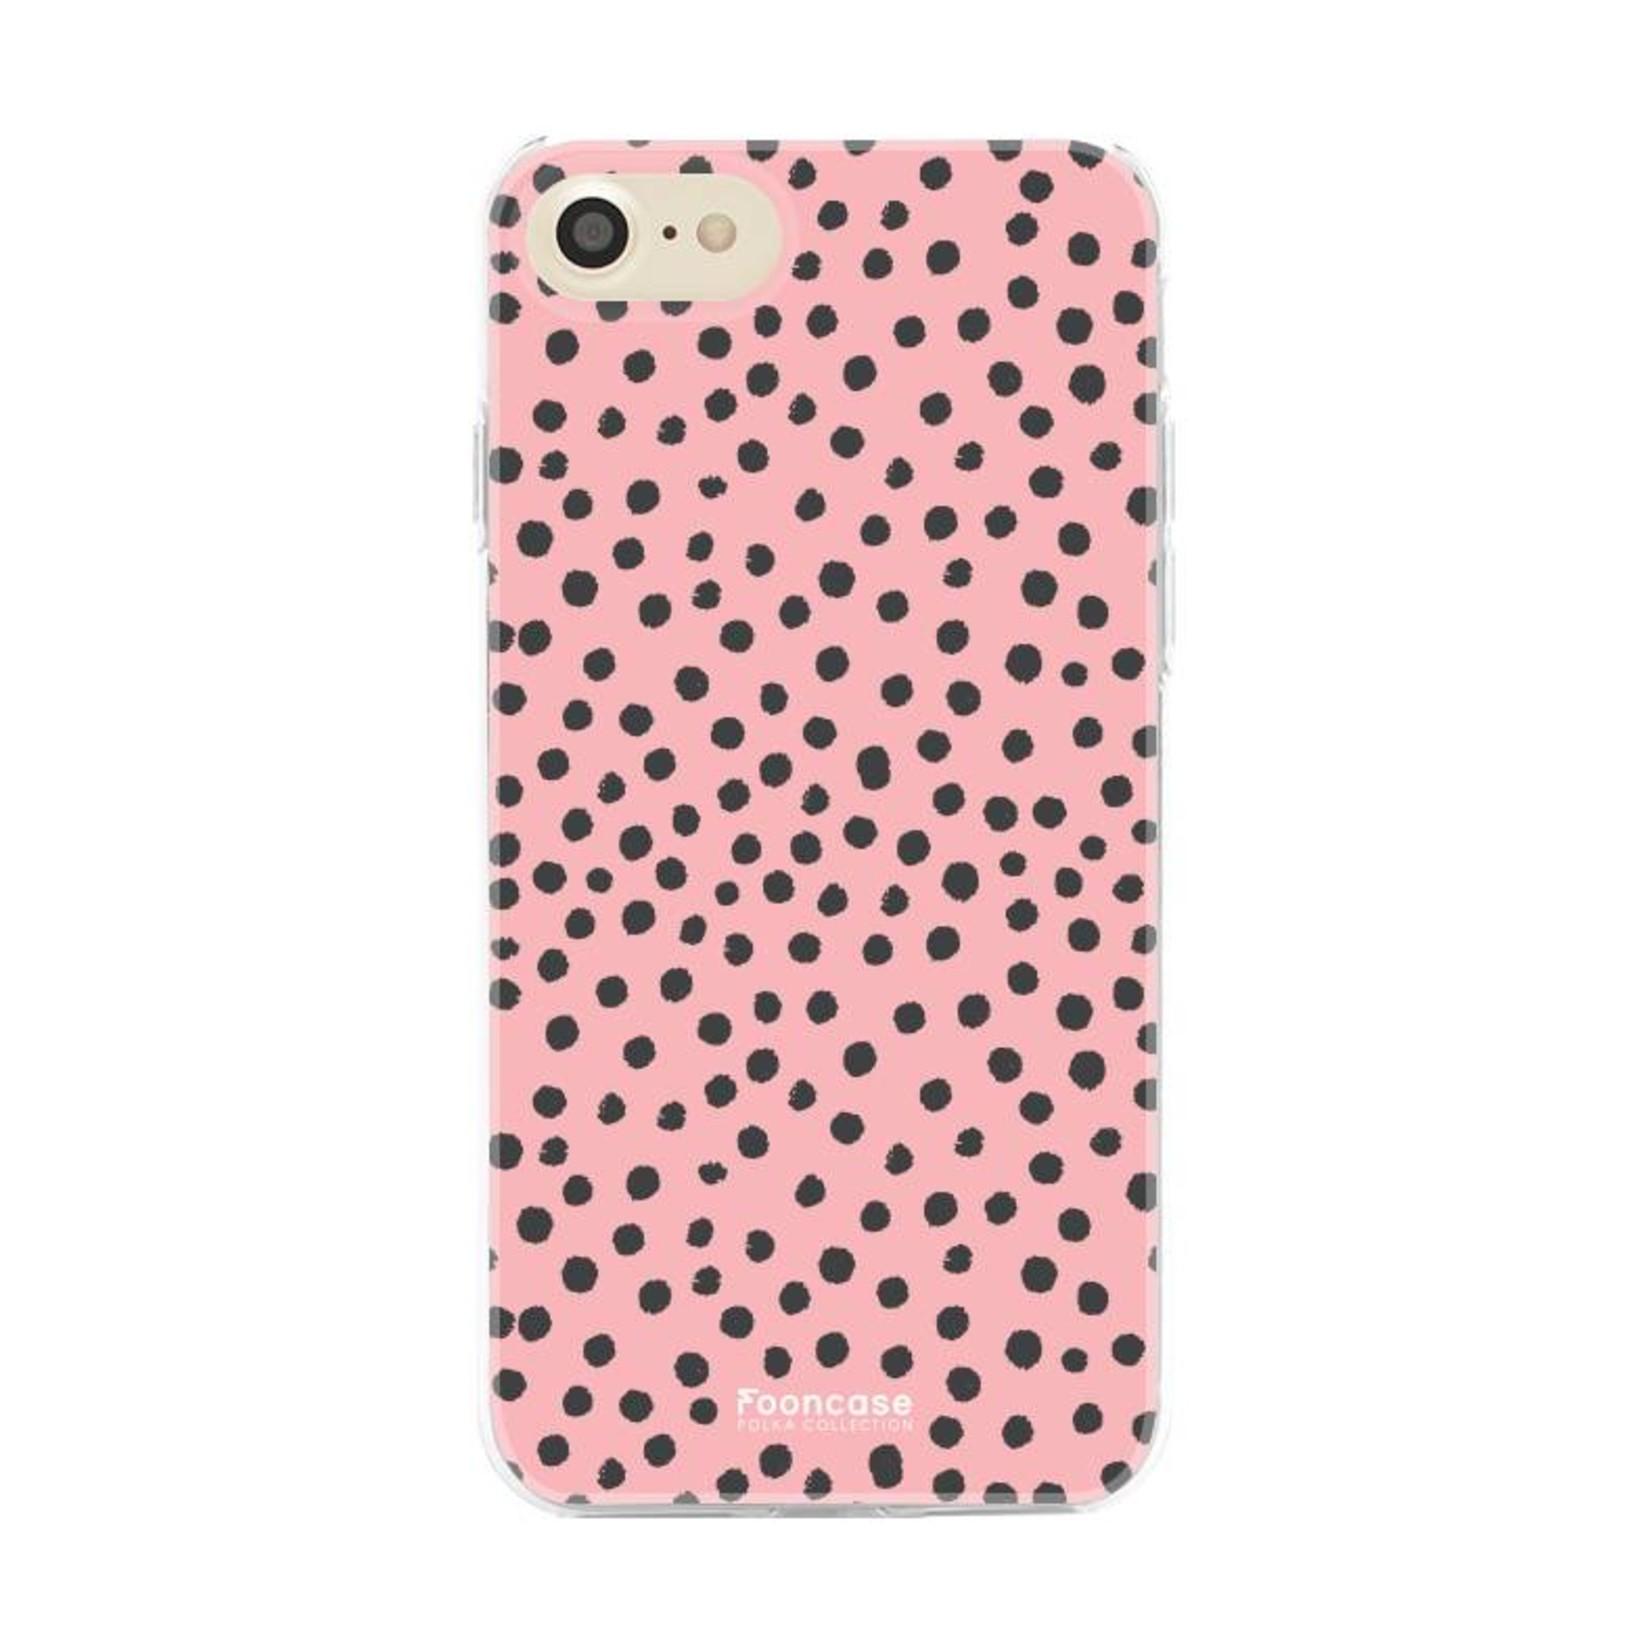 FOONCASE iPhone 7 hoesje TPU Soft Case - Back Cover - POLKA COLLECTION / Stipjes / Stippen / Roze